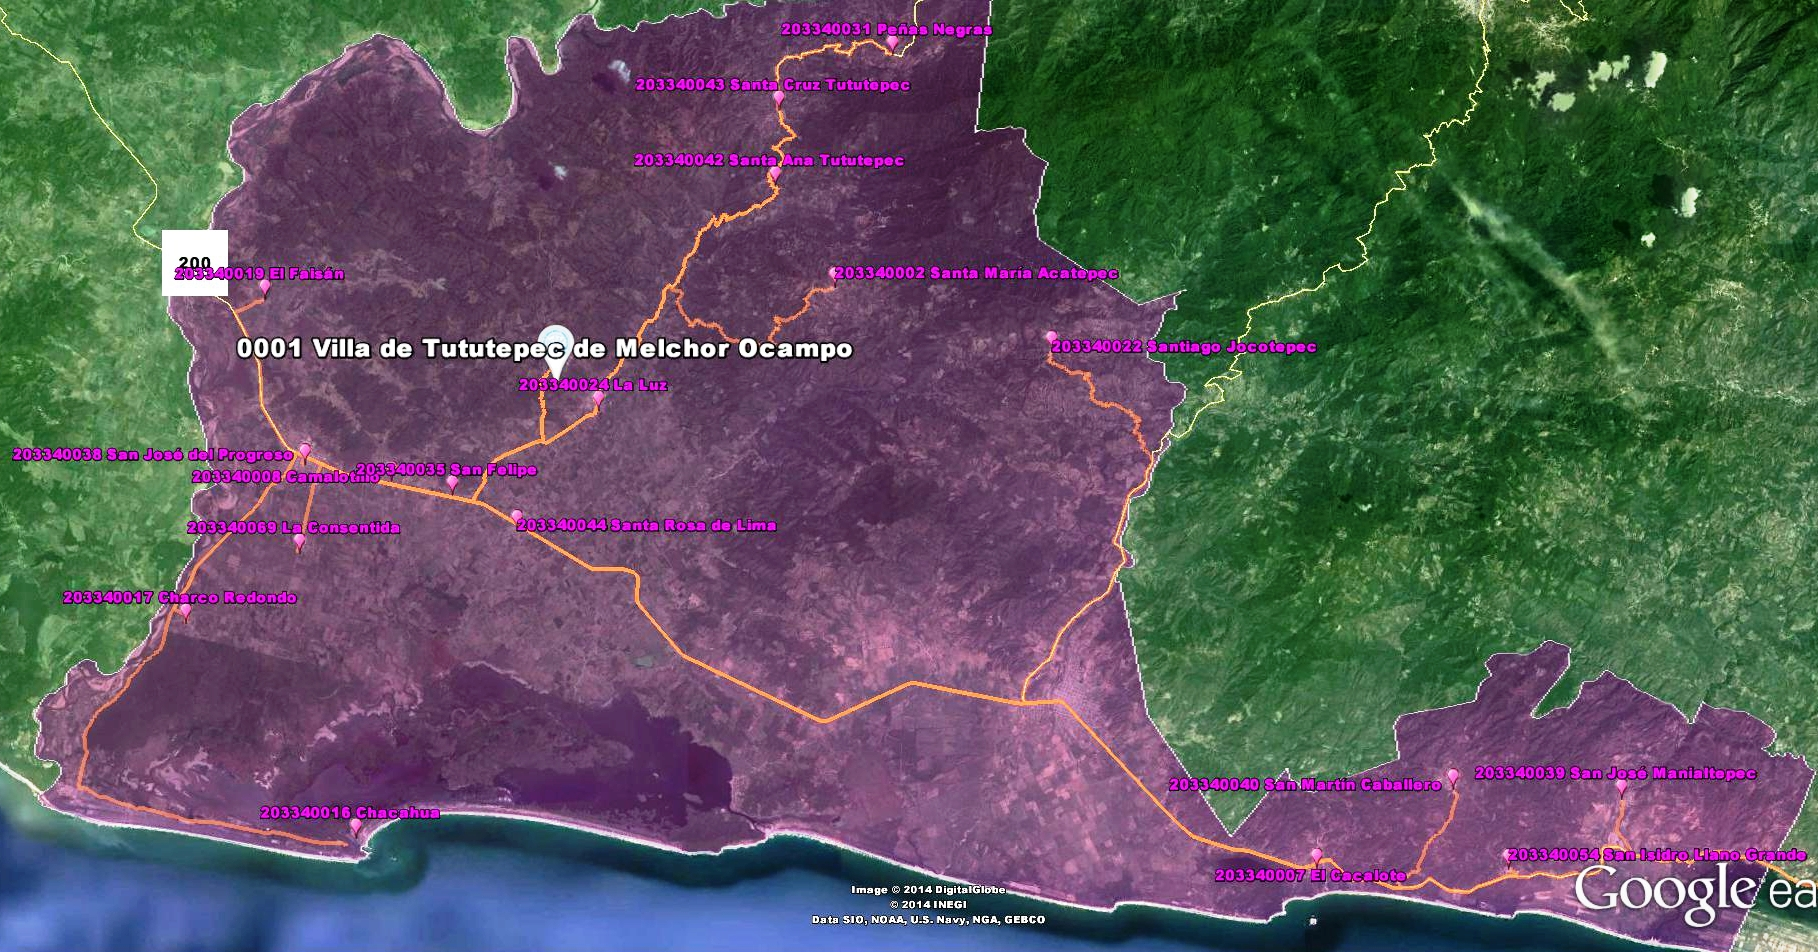 mapa de la zona mazahua de Oaxaca